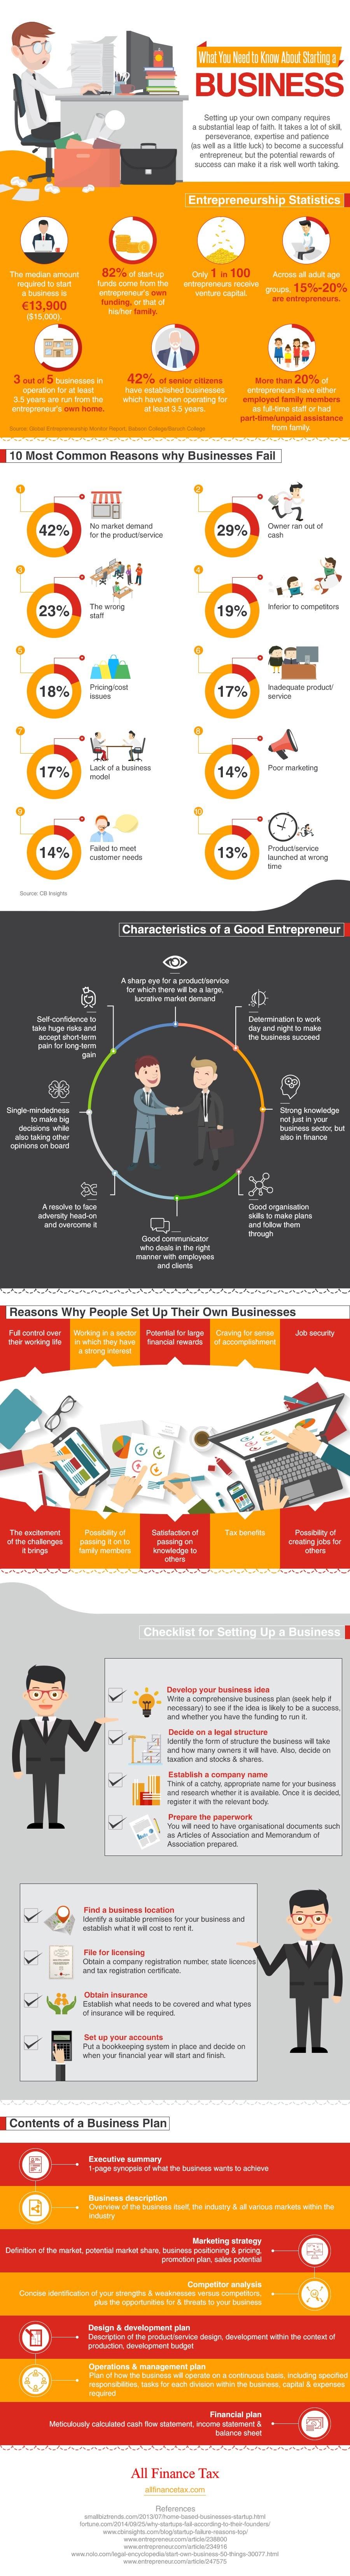 Know Business info